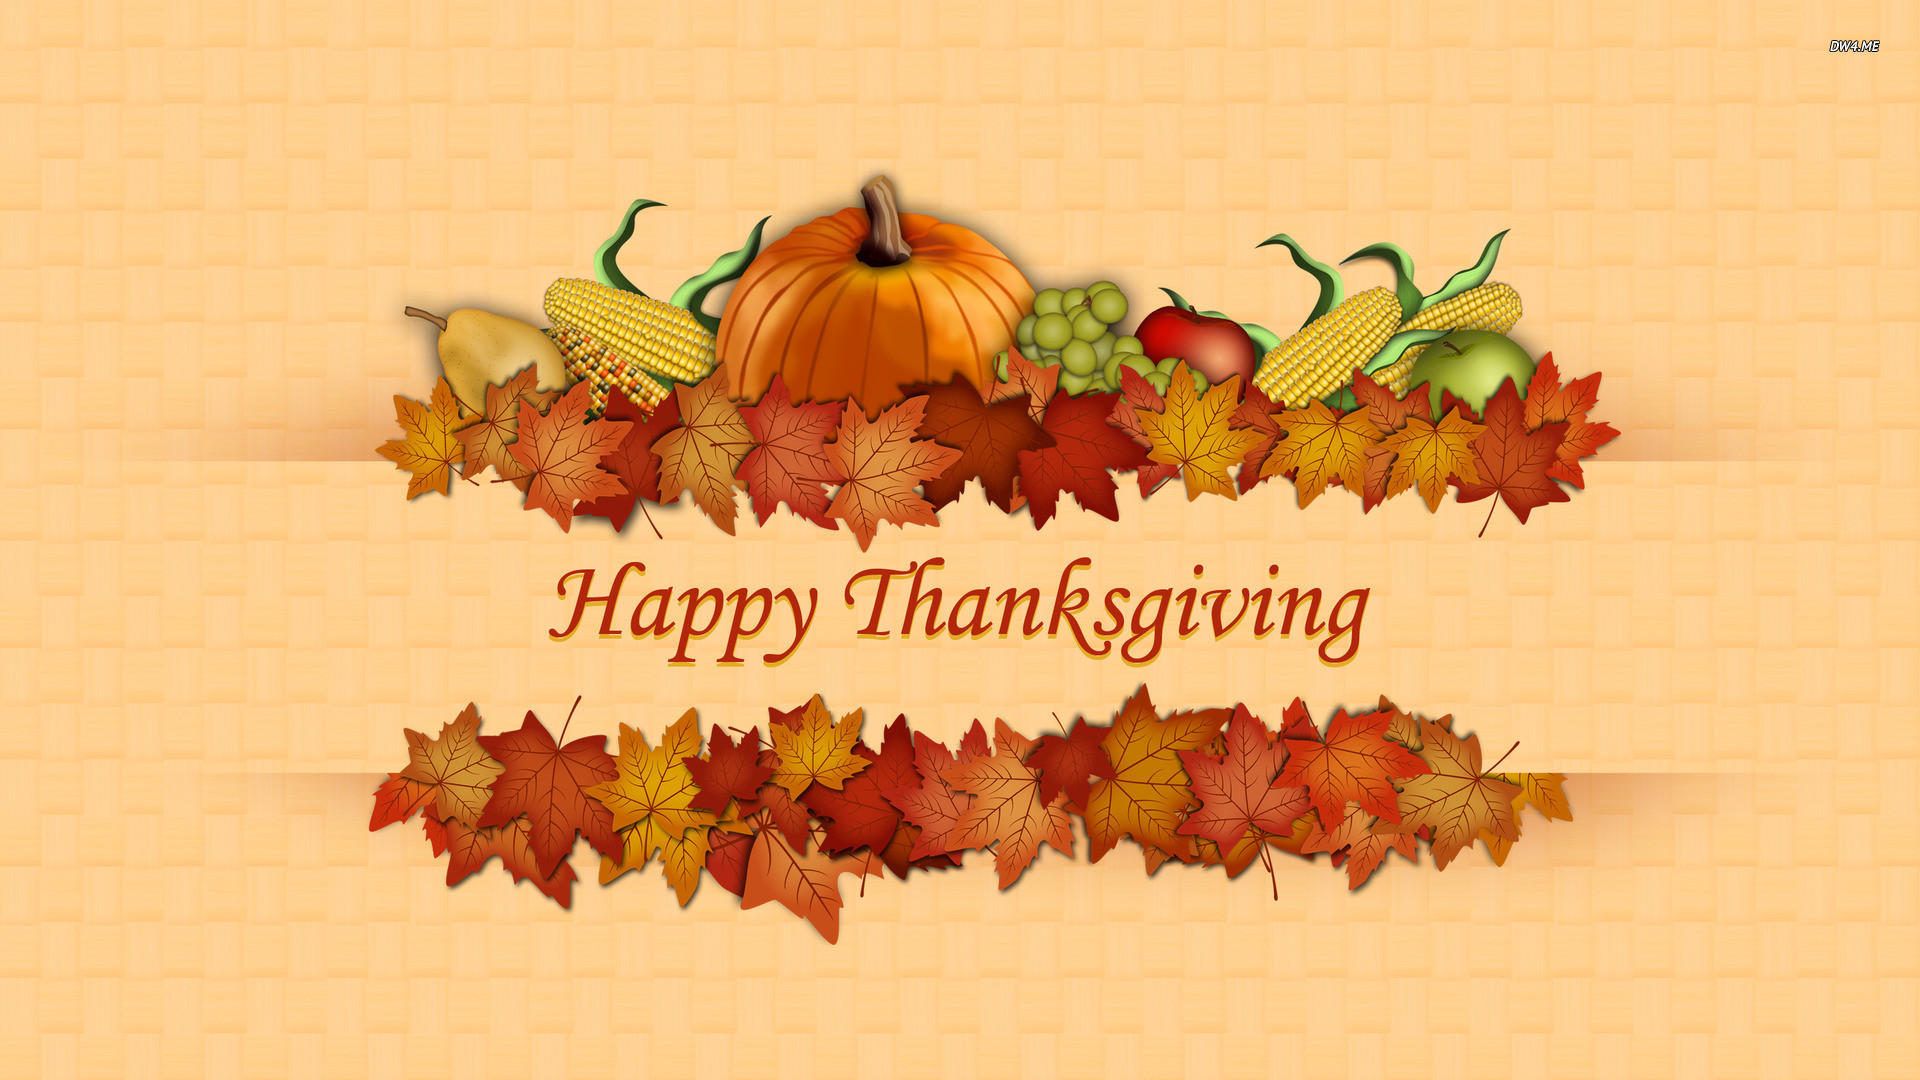 free-happy-thanksgiving-2013-wallpapers-desktop-backgrounds (1)